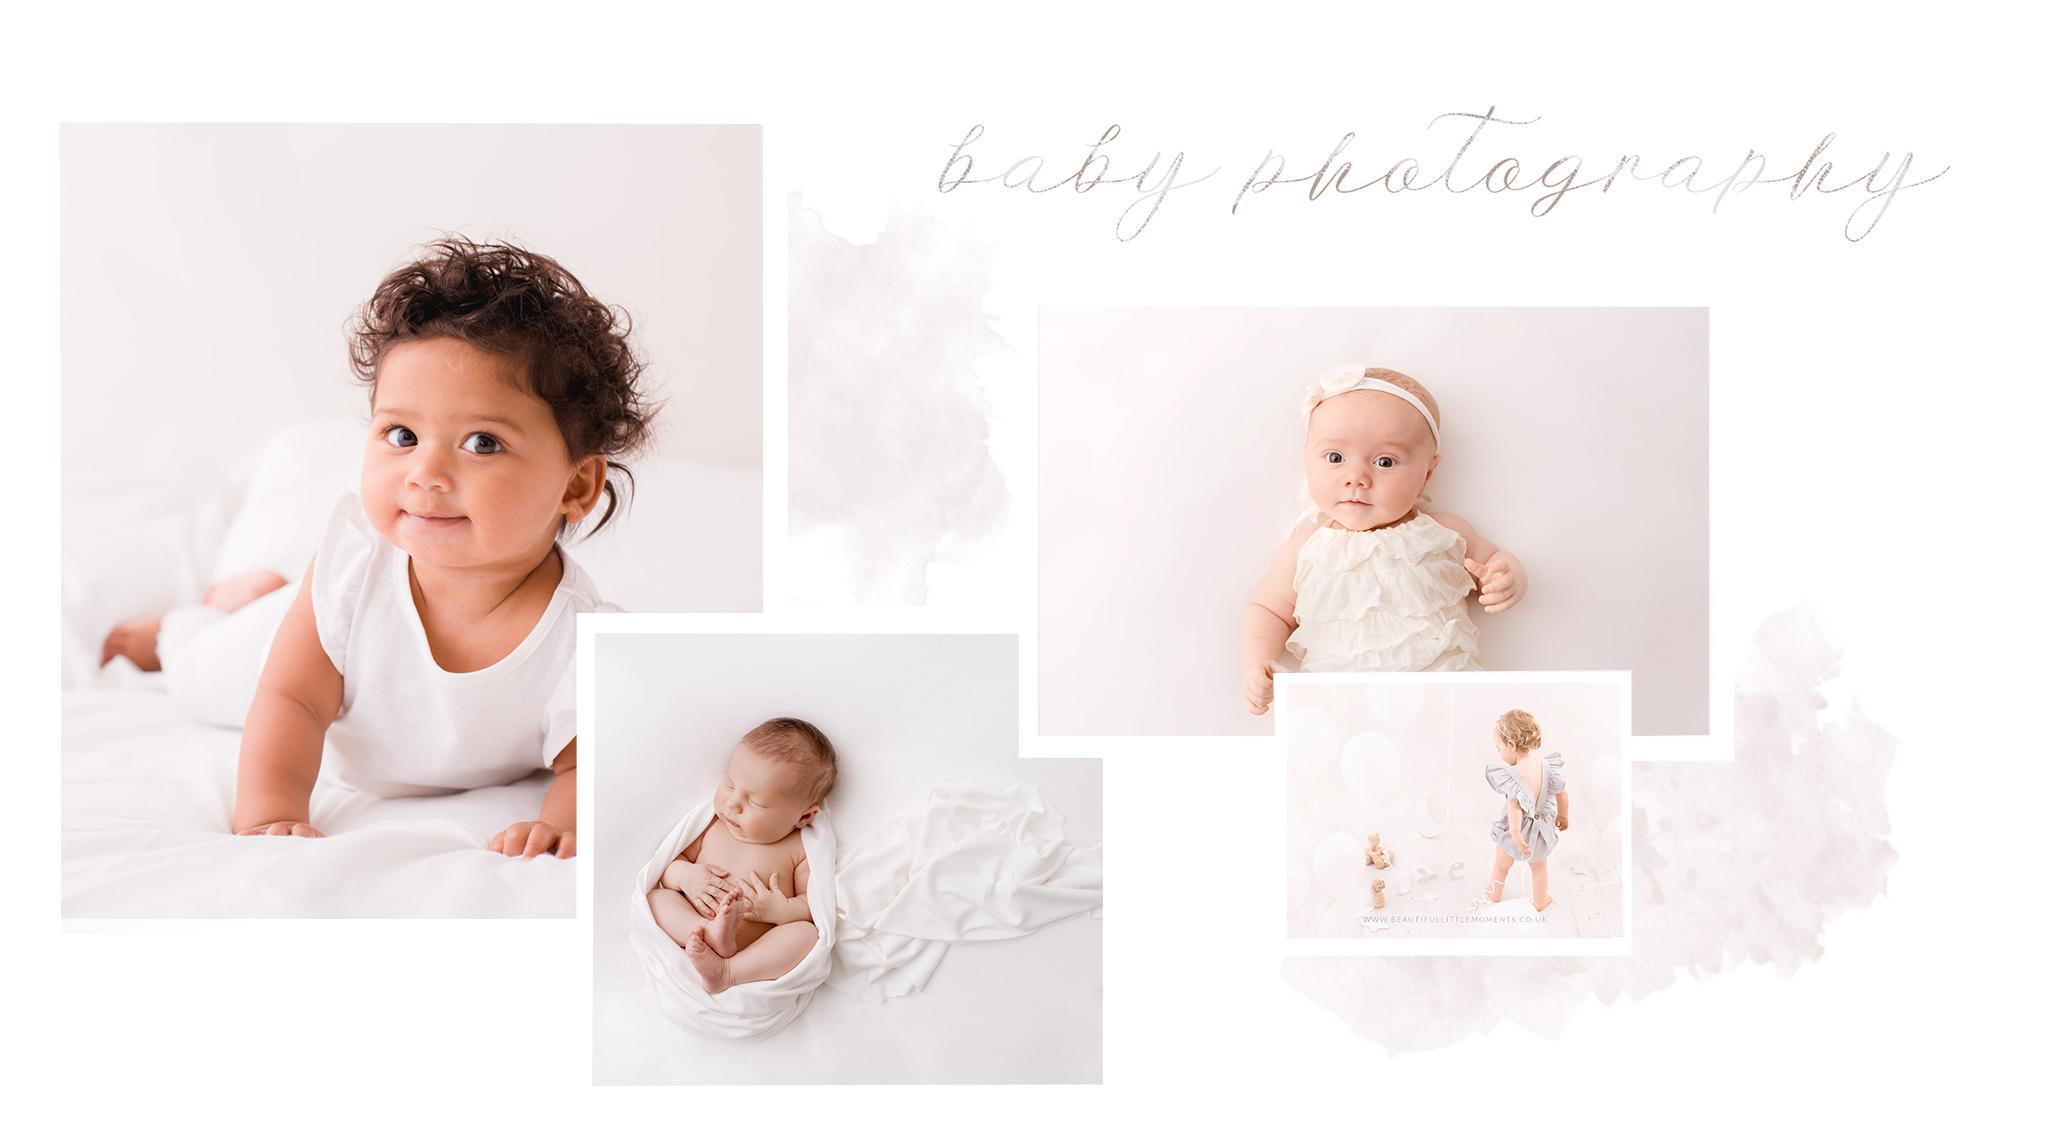 newborn through to first birthday baby photography epsom surrey